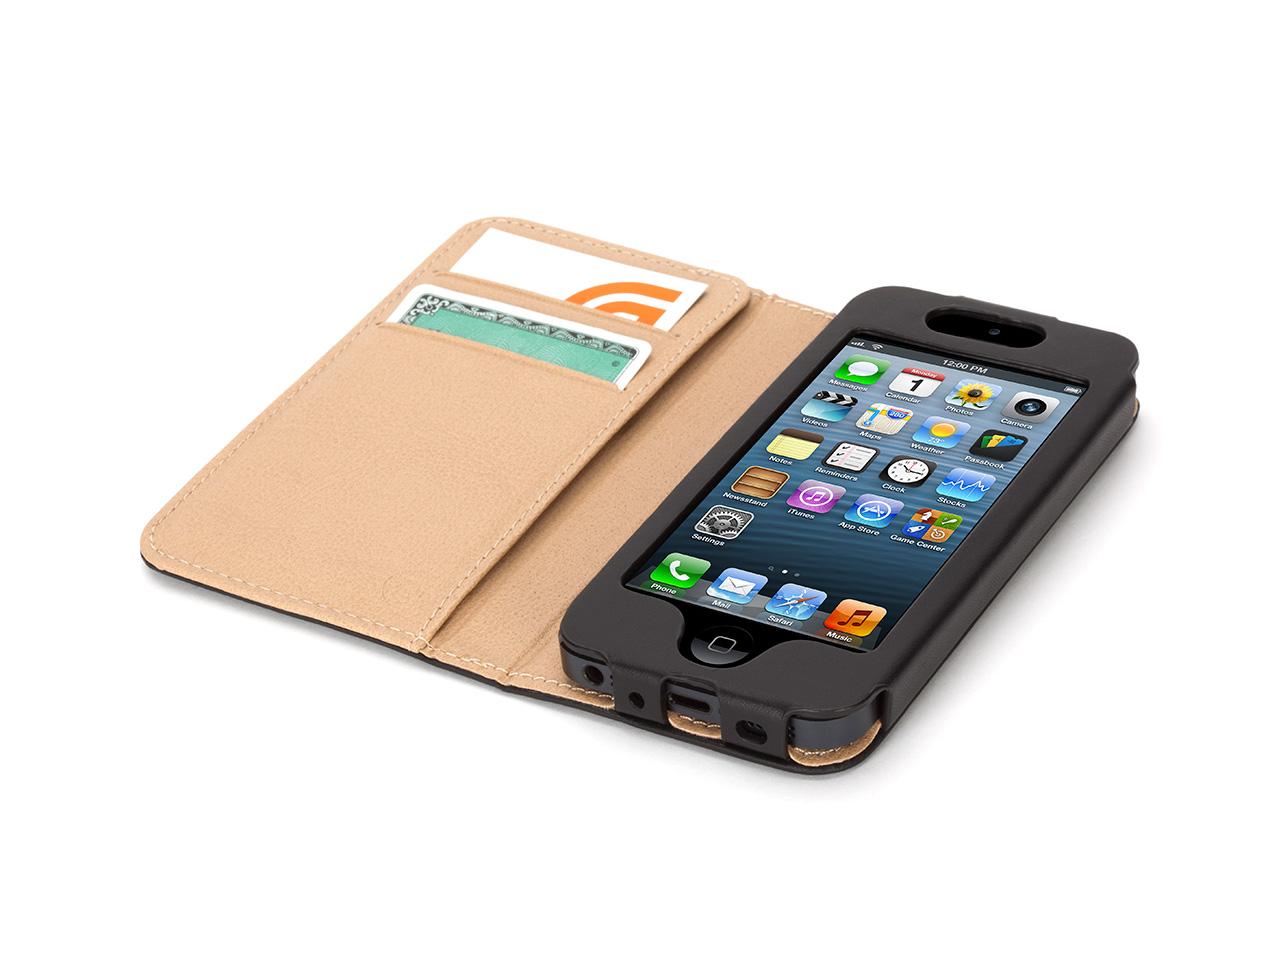 Midtown Bi-fold Wallet Case for iPhone 5/5s & 5c